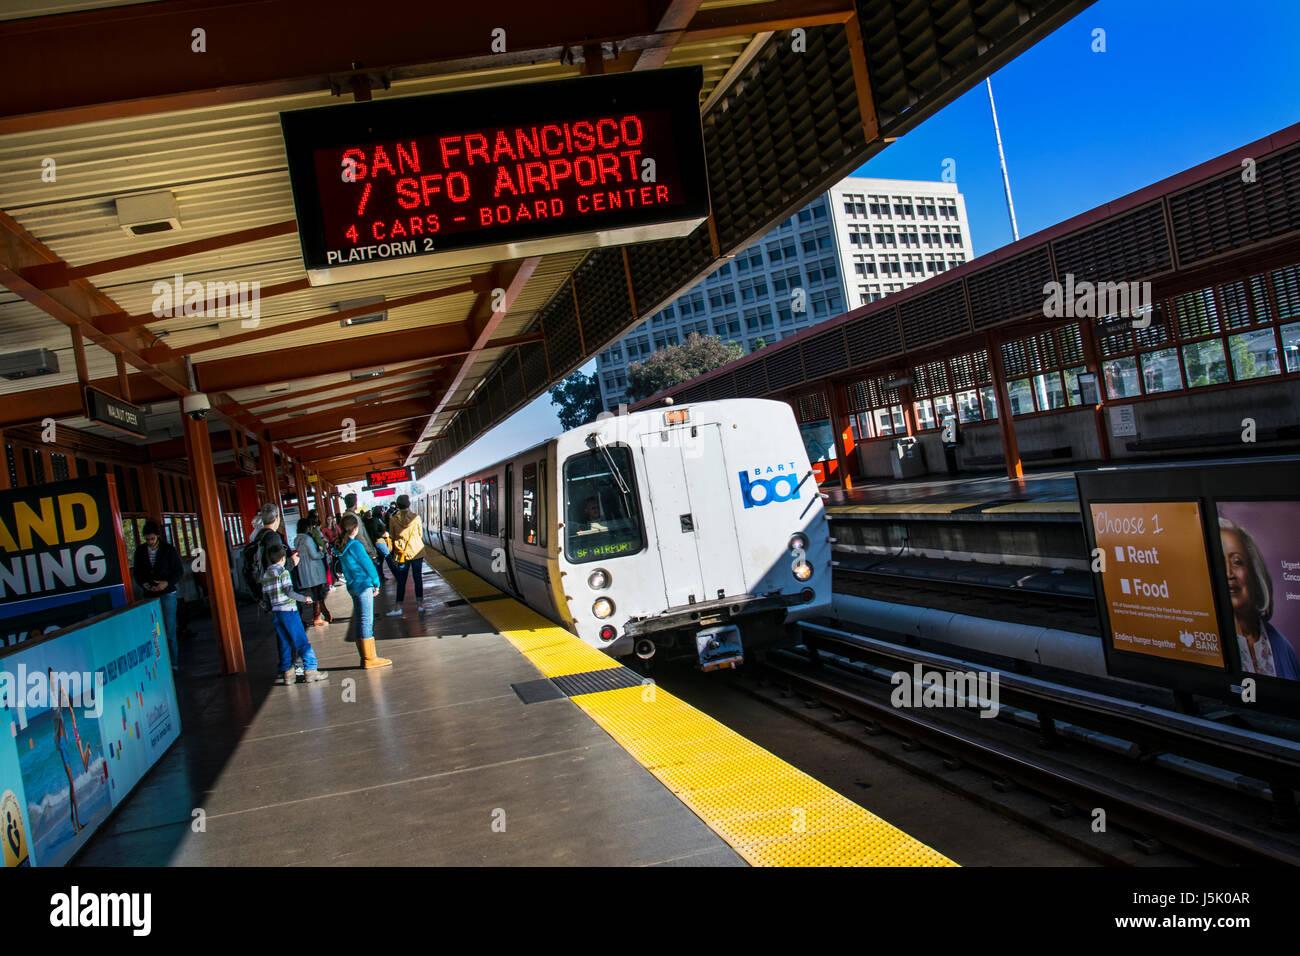 San Francisco BART train arriving at Walnut Creek. 'Bay Area Rapid Transit' train system servicing San Francisco - Stock Image